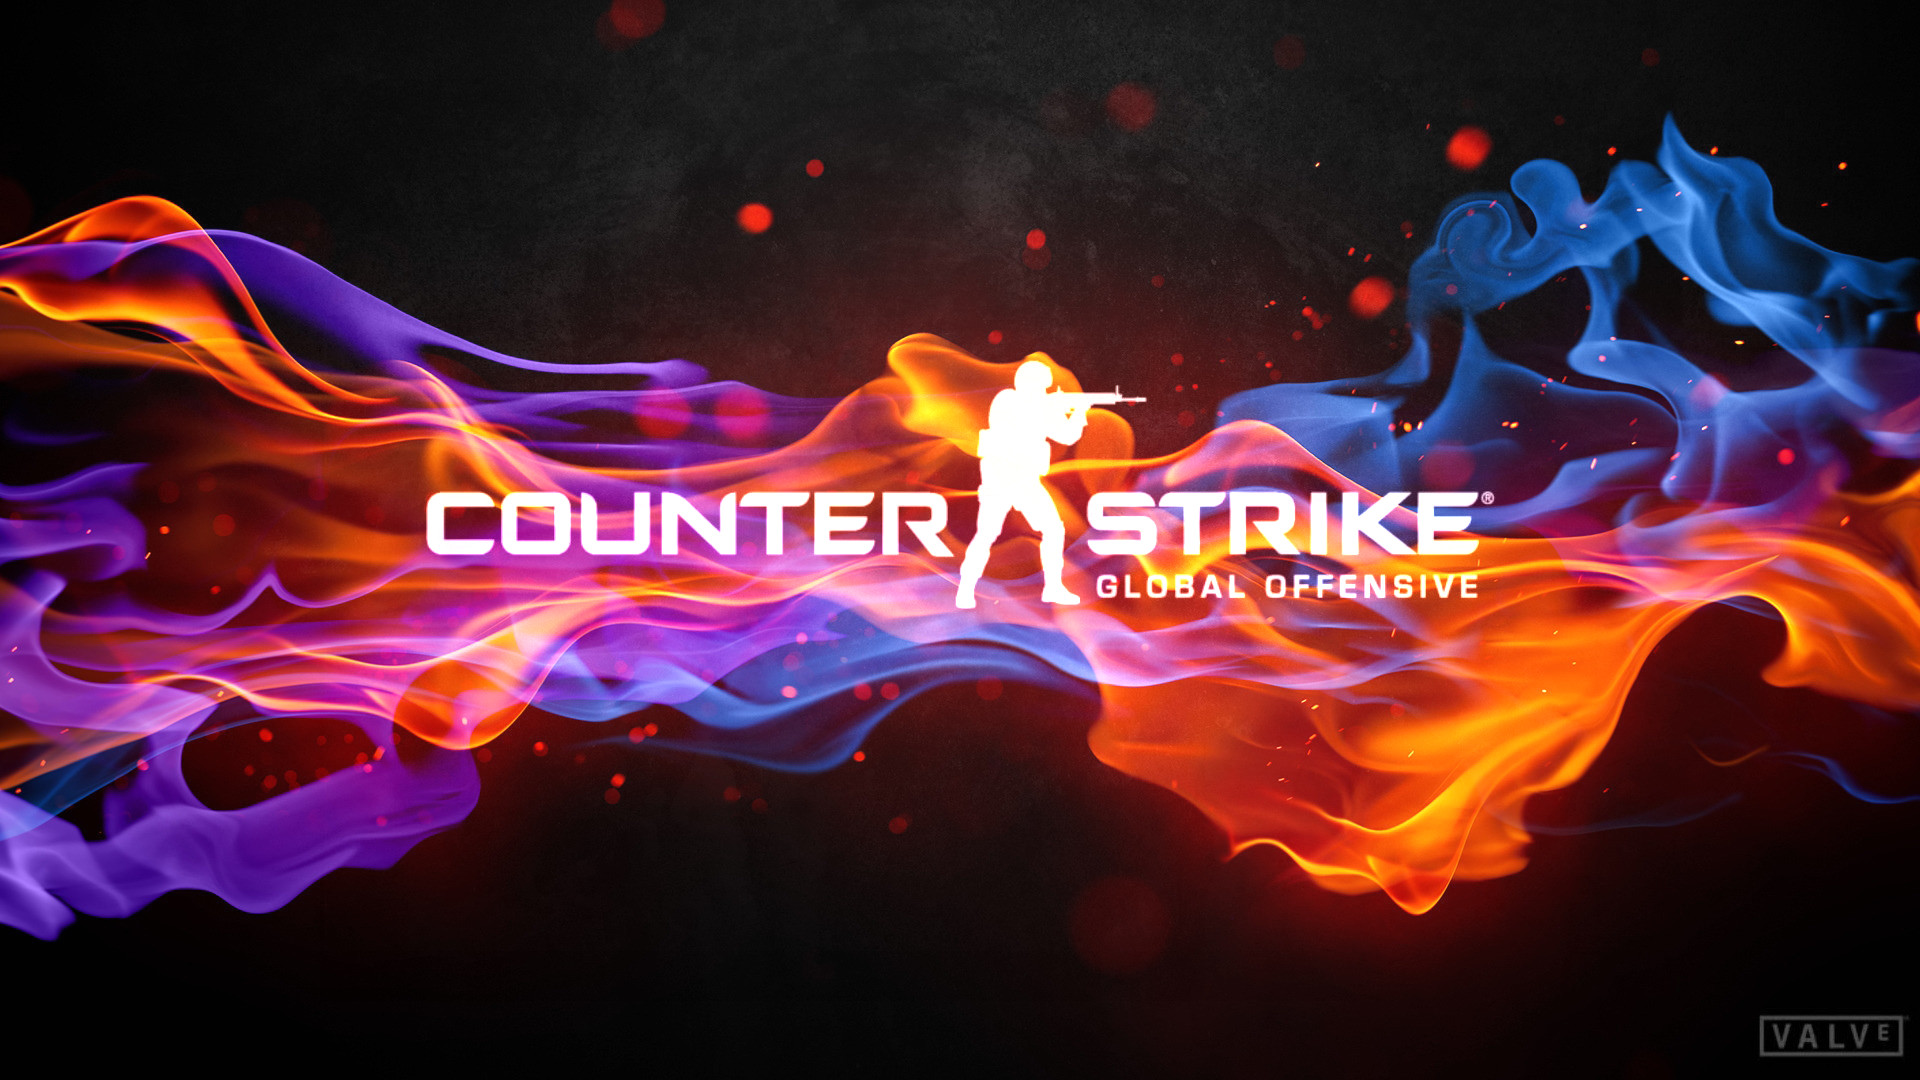 Counter Strike Global Offensive Wallpaper High Definition